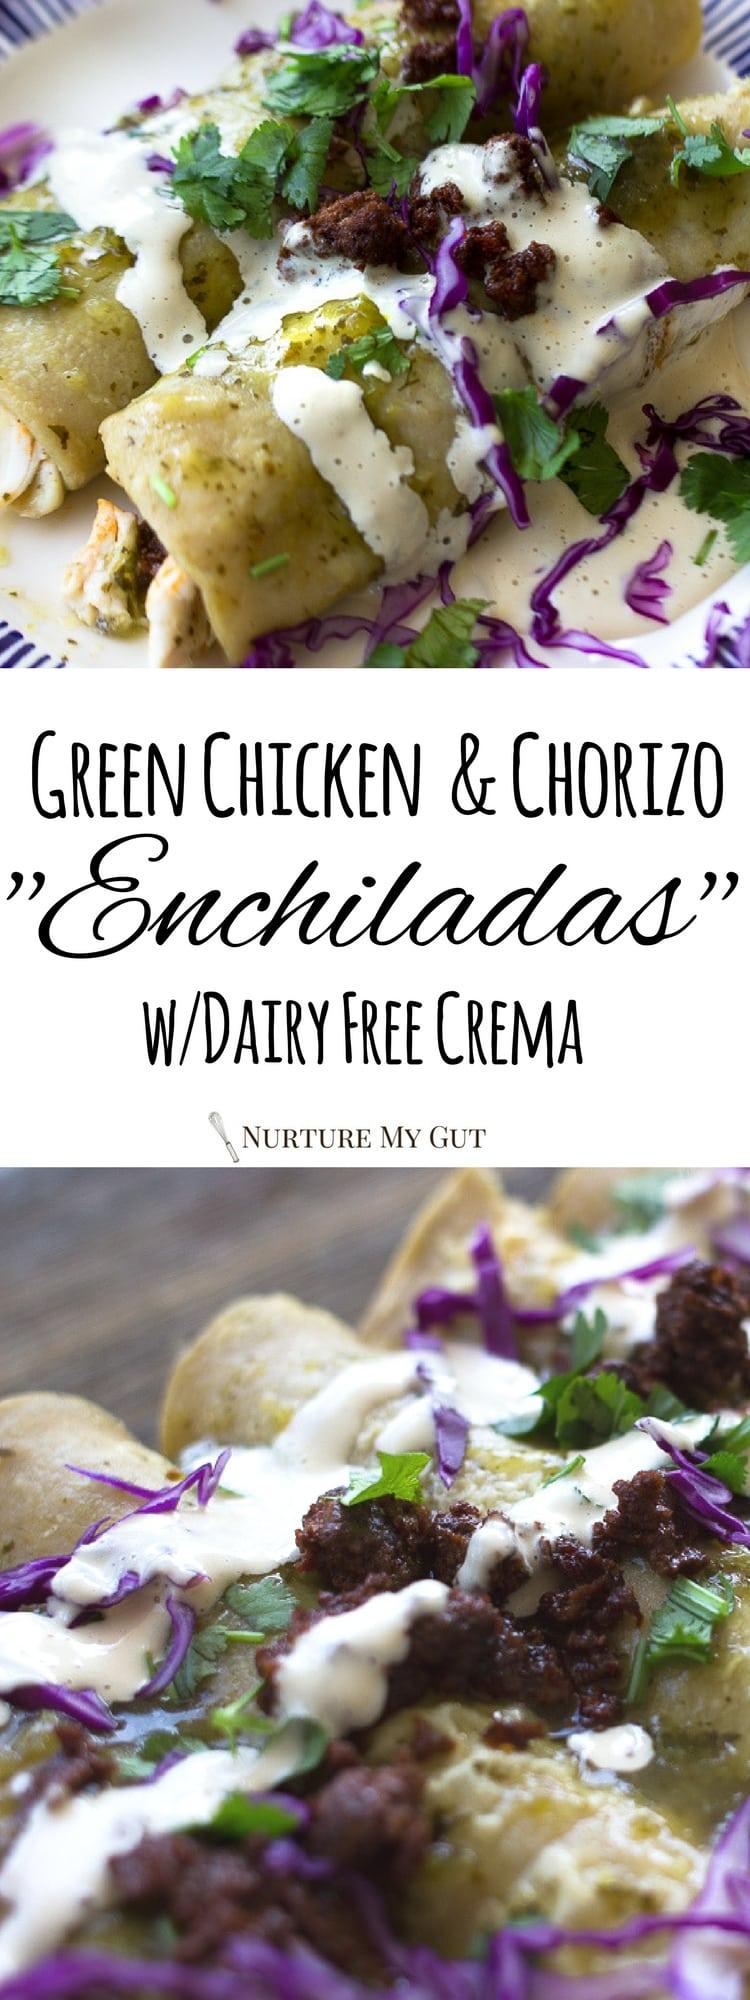 Green Chicken & Chorizo Enchiladas with Dairy Free Crema